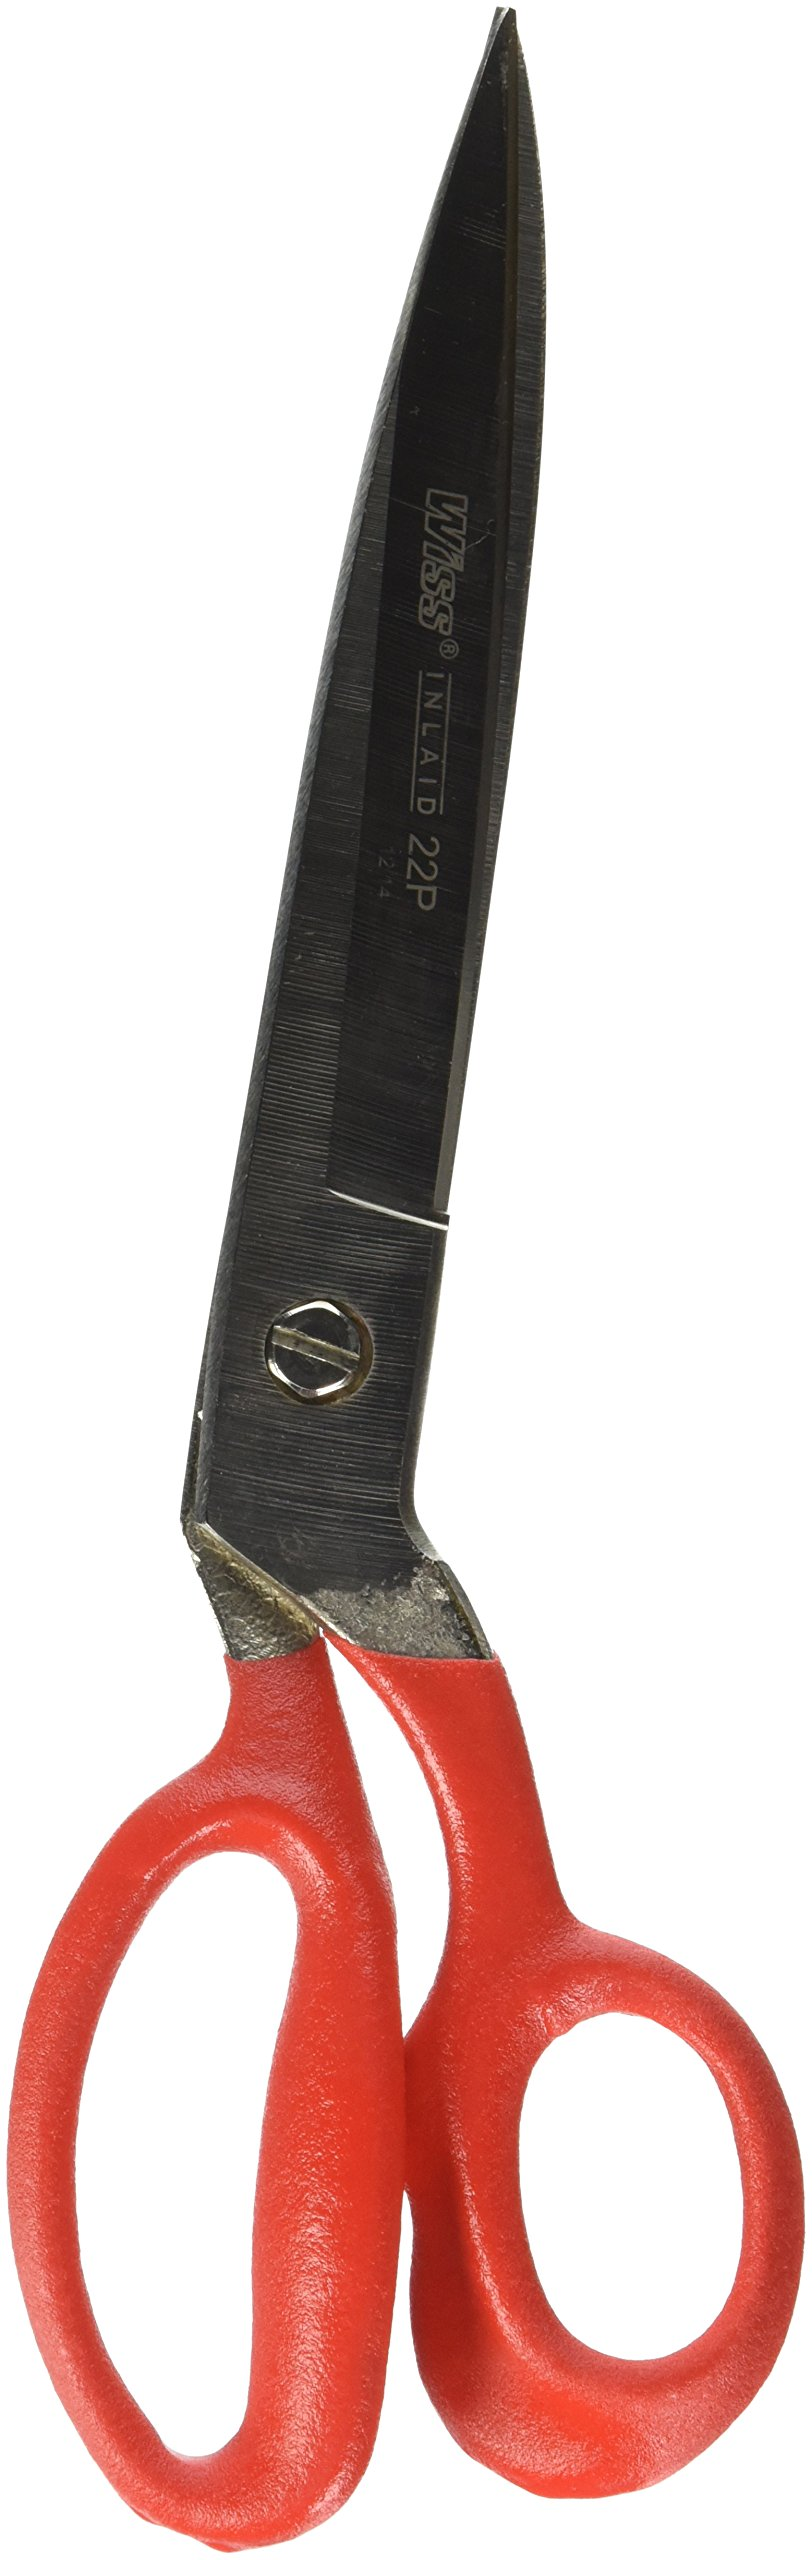 Wiss 22PN 12 1/4'' Heavy Duty Industrial Shears, Inlaid, Cushion Grip